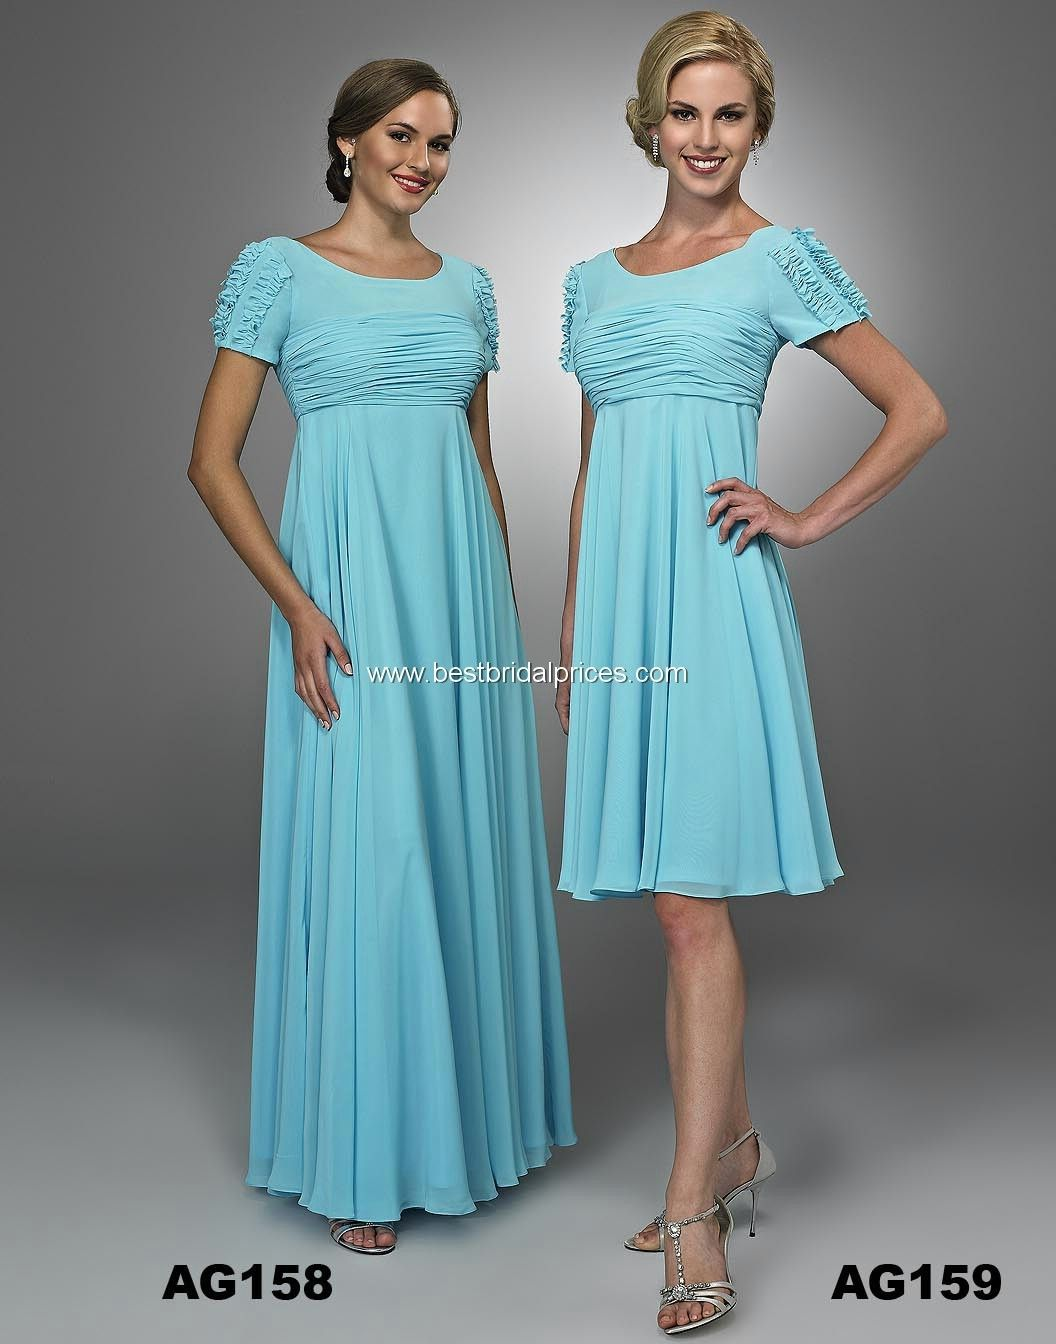 Landa Modest Bridesmaid Dresses - Style AG158 (long) [AG158 ...